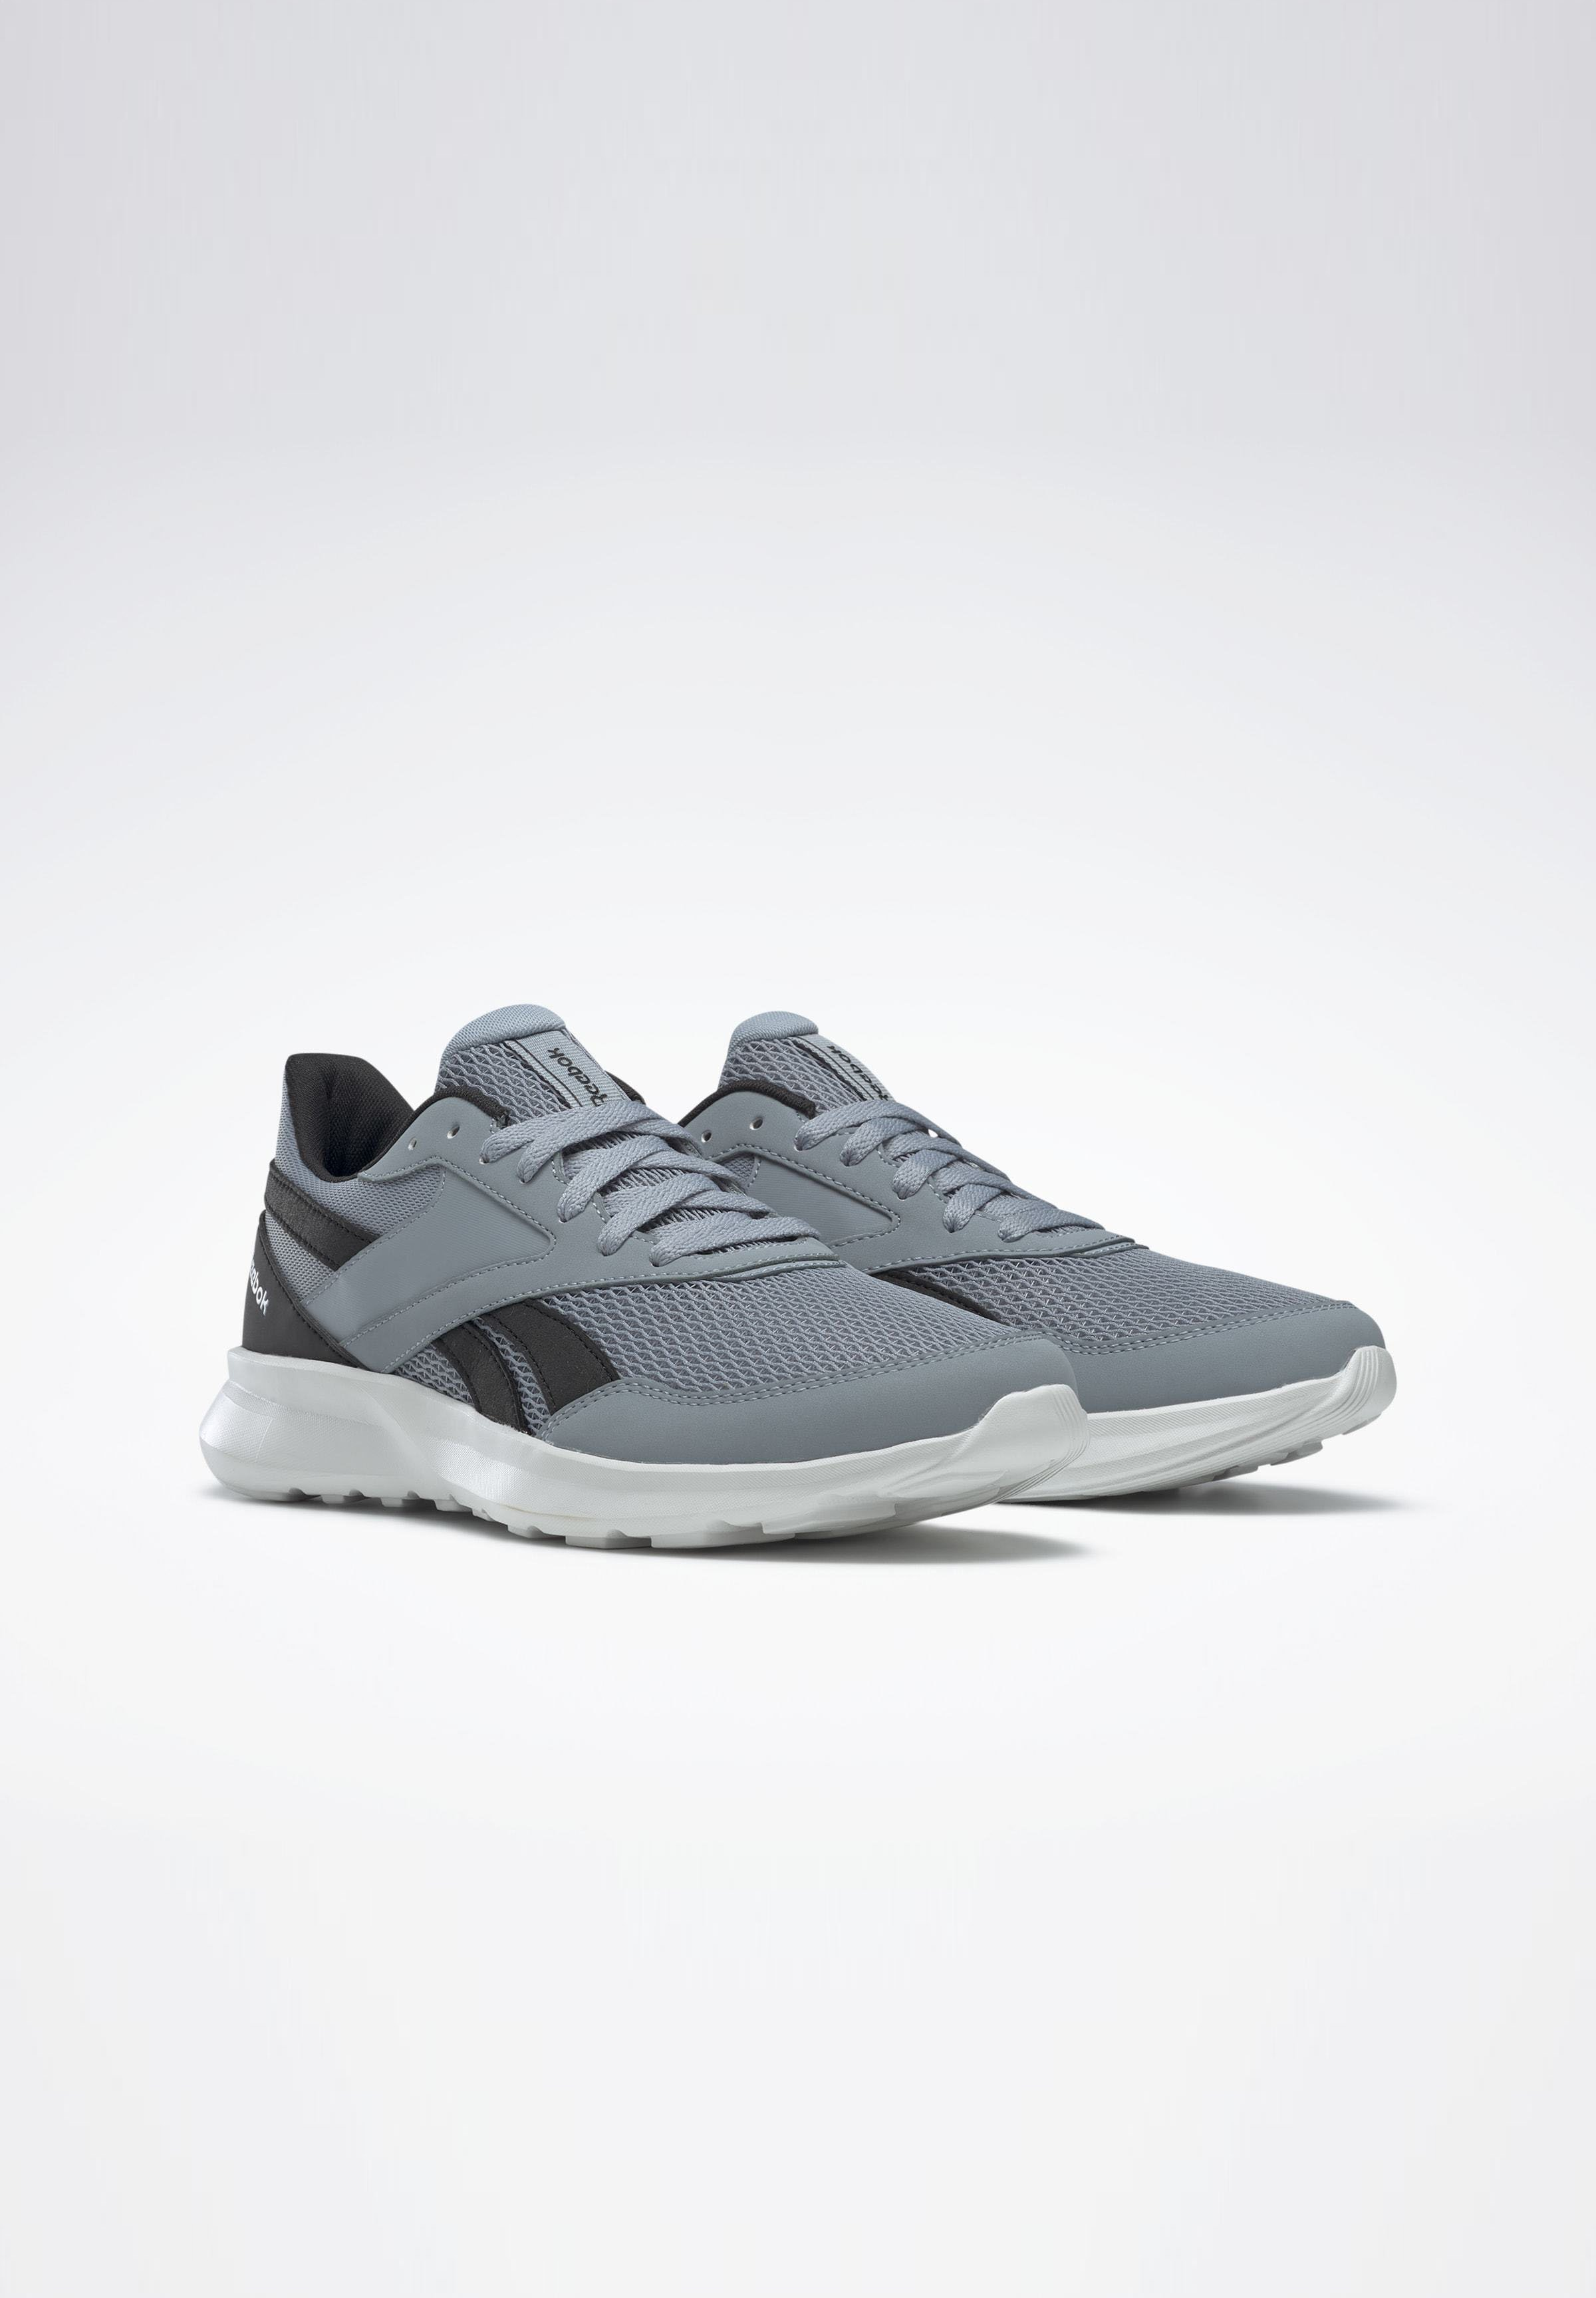 REEBOK QUICK MOTION 2.0 SHOES Chaussures de running neutres grey